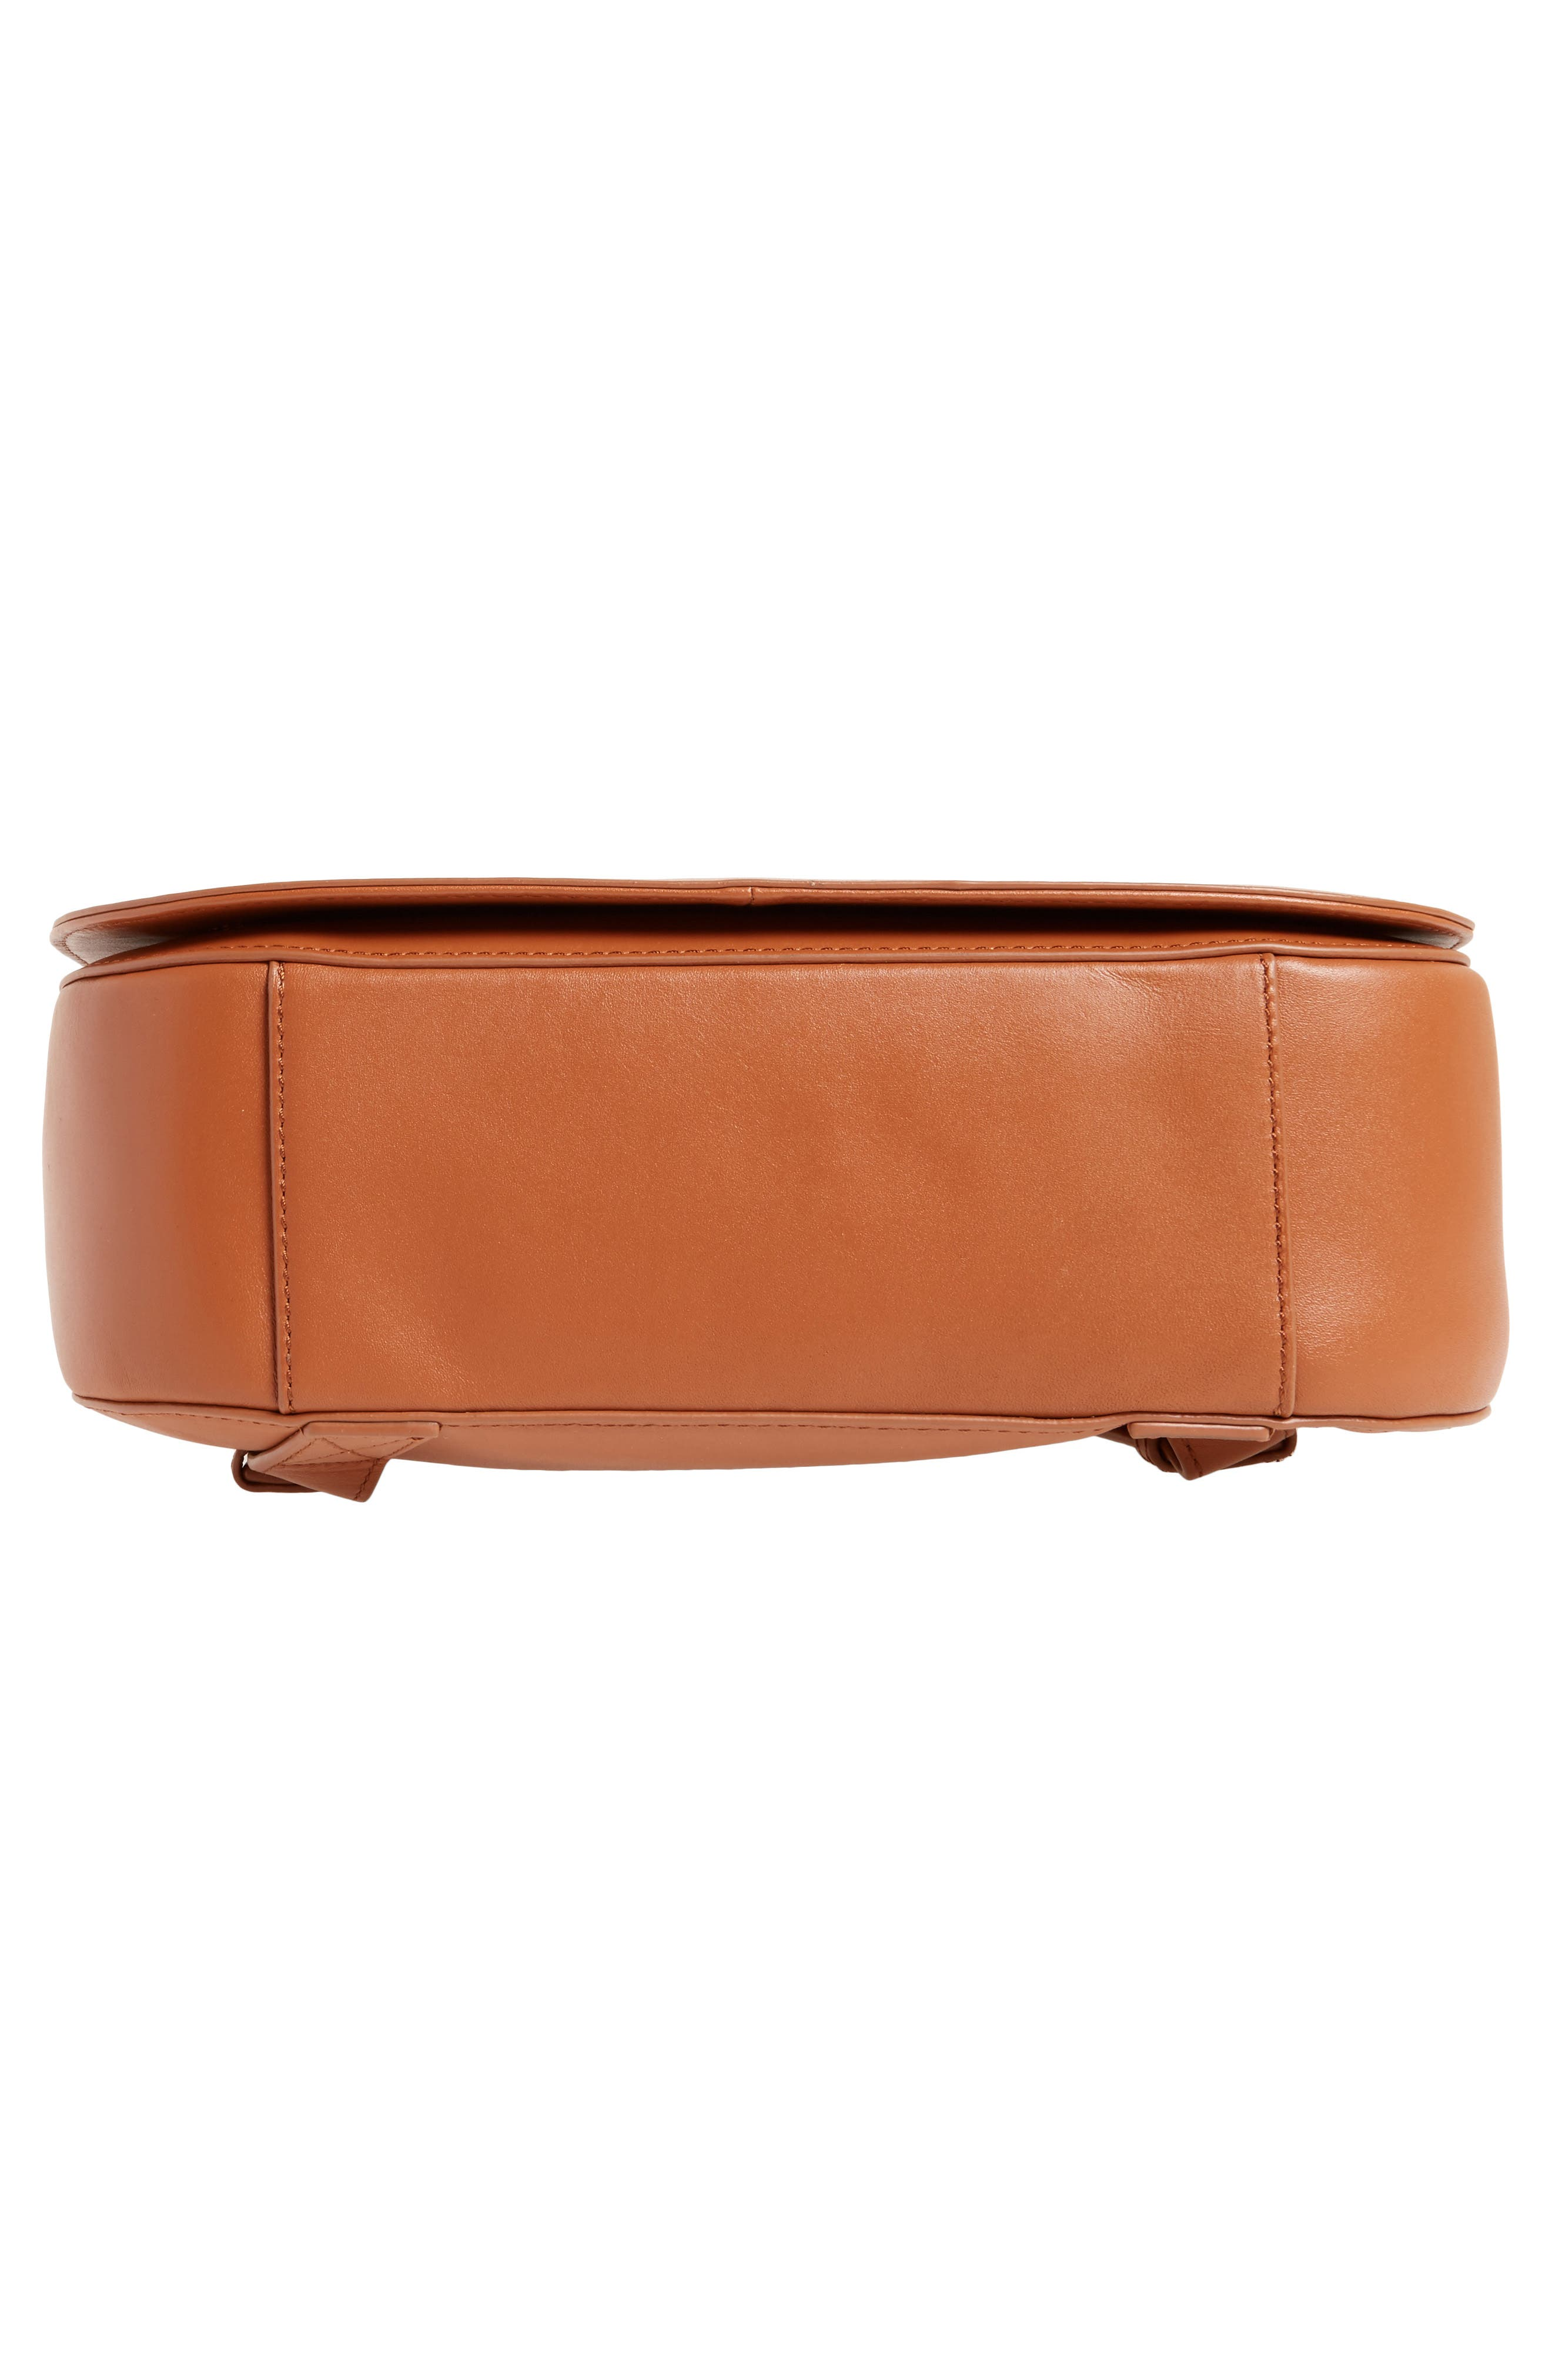 Kate Calfskin Leather Backpack,                             Alternate thumbnail 6, color,                             Saddle